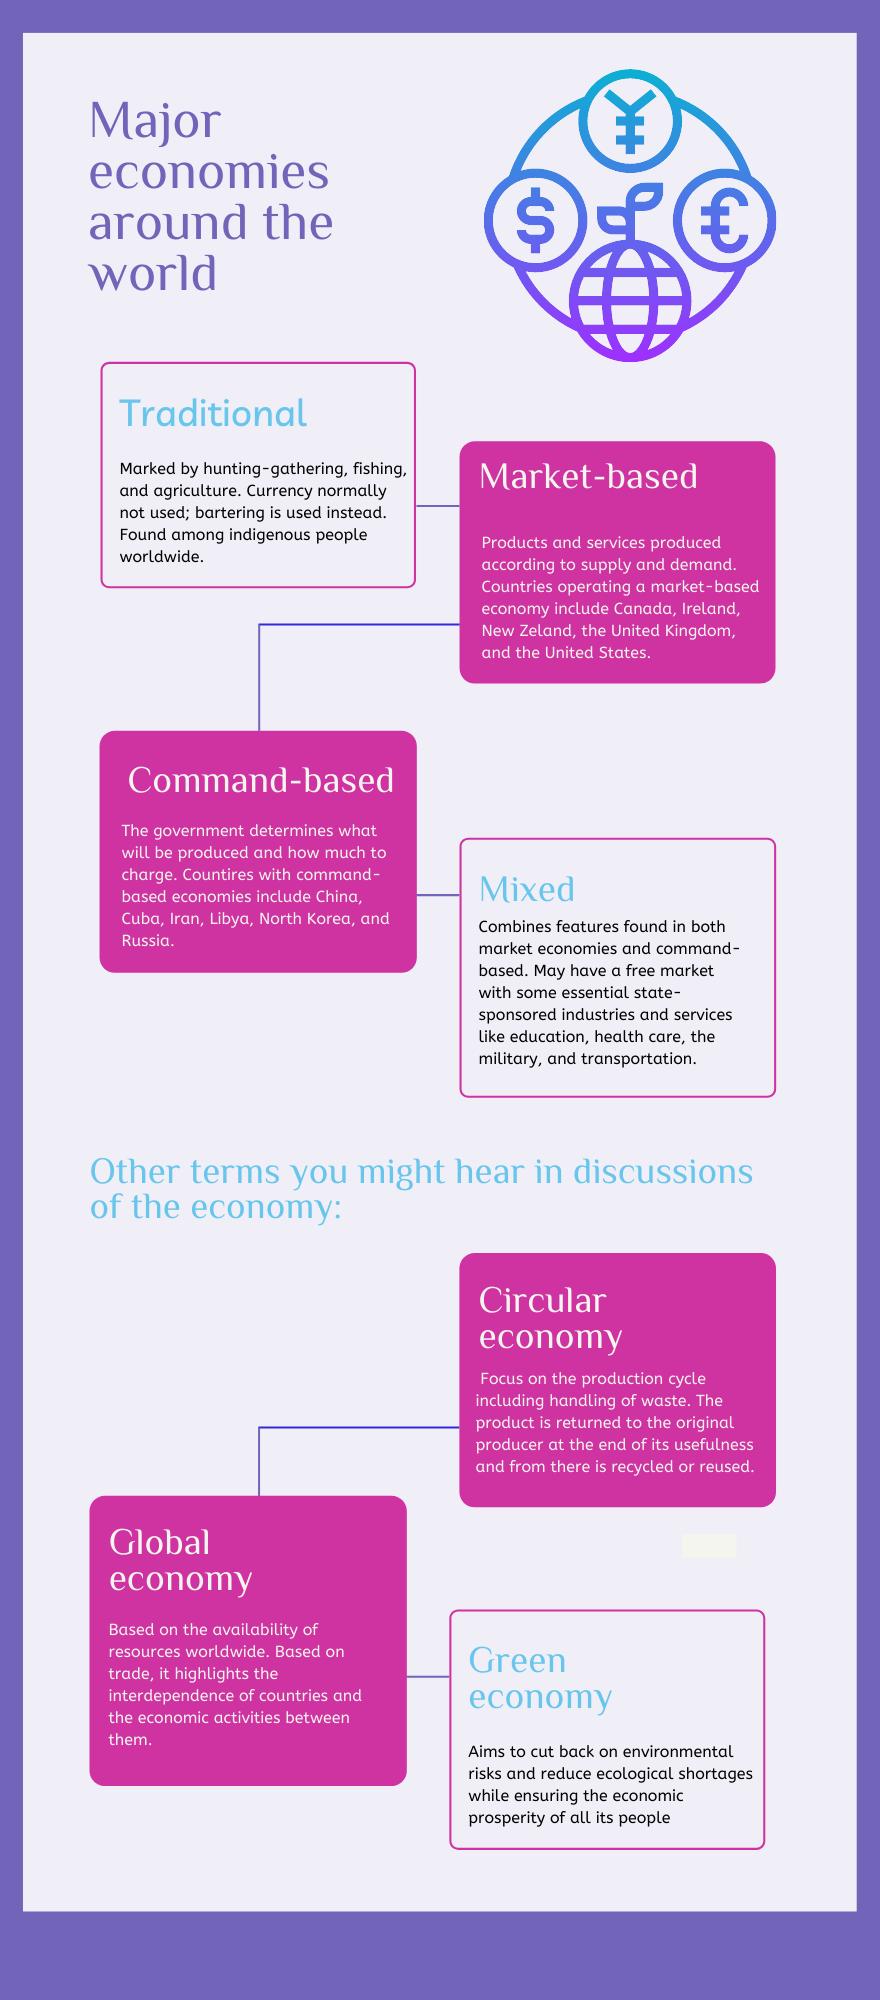 Economies worldwide